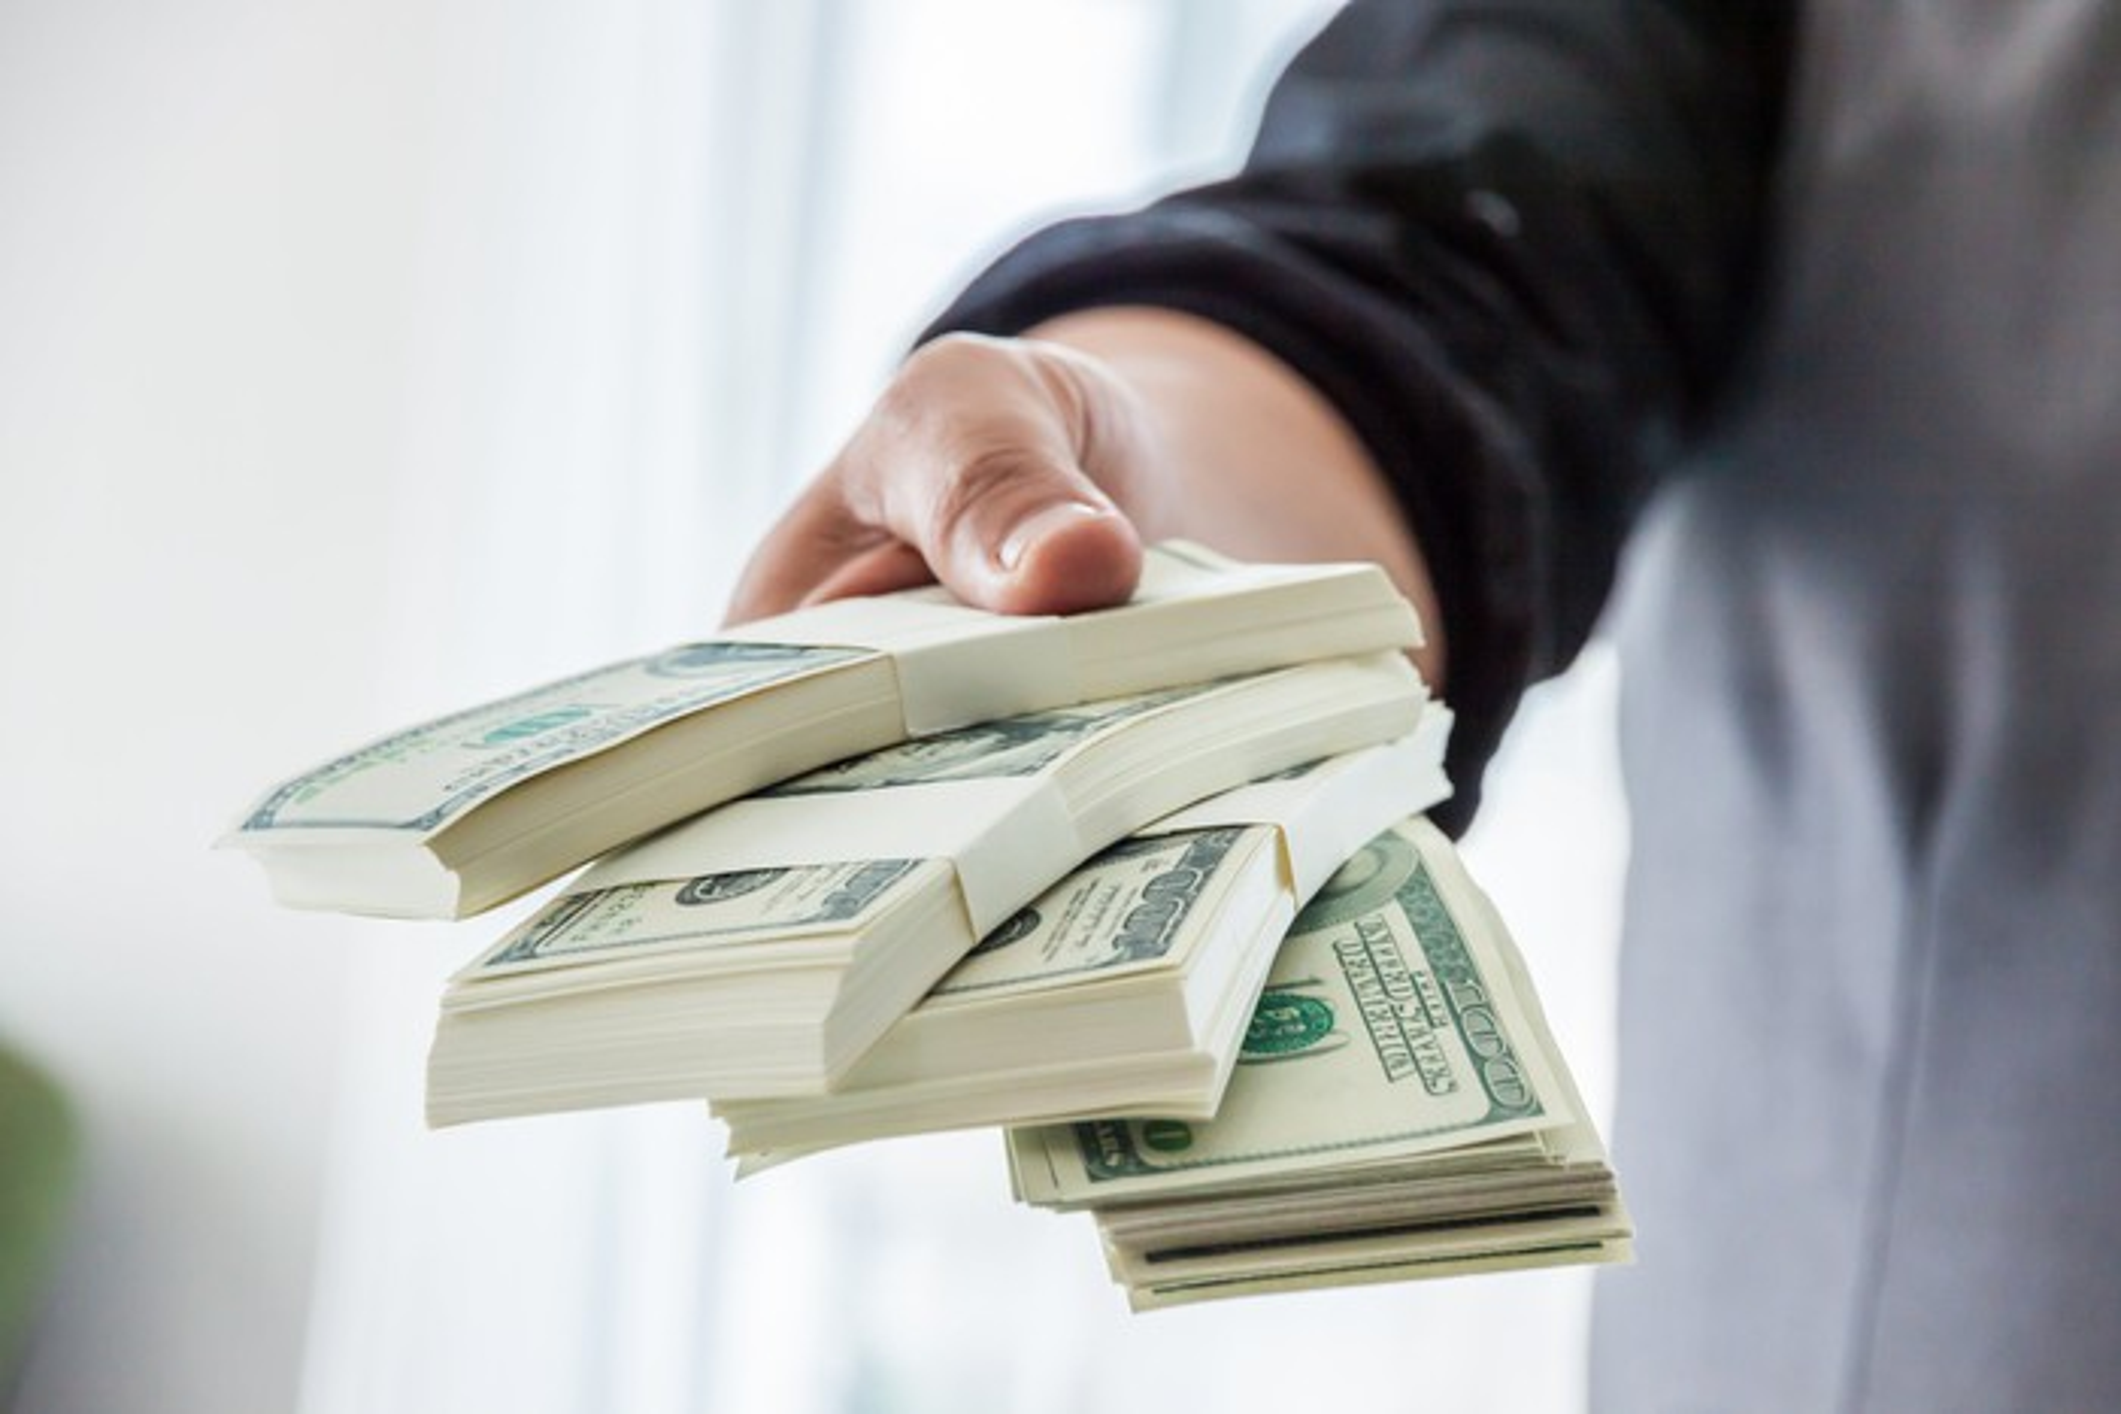 A businessman hands over stacks of $100 bills.